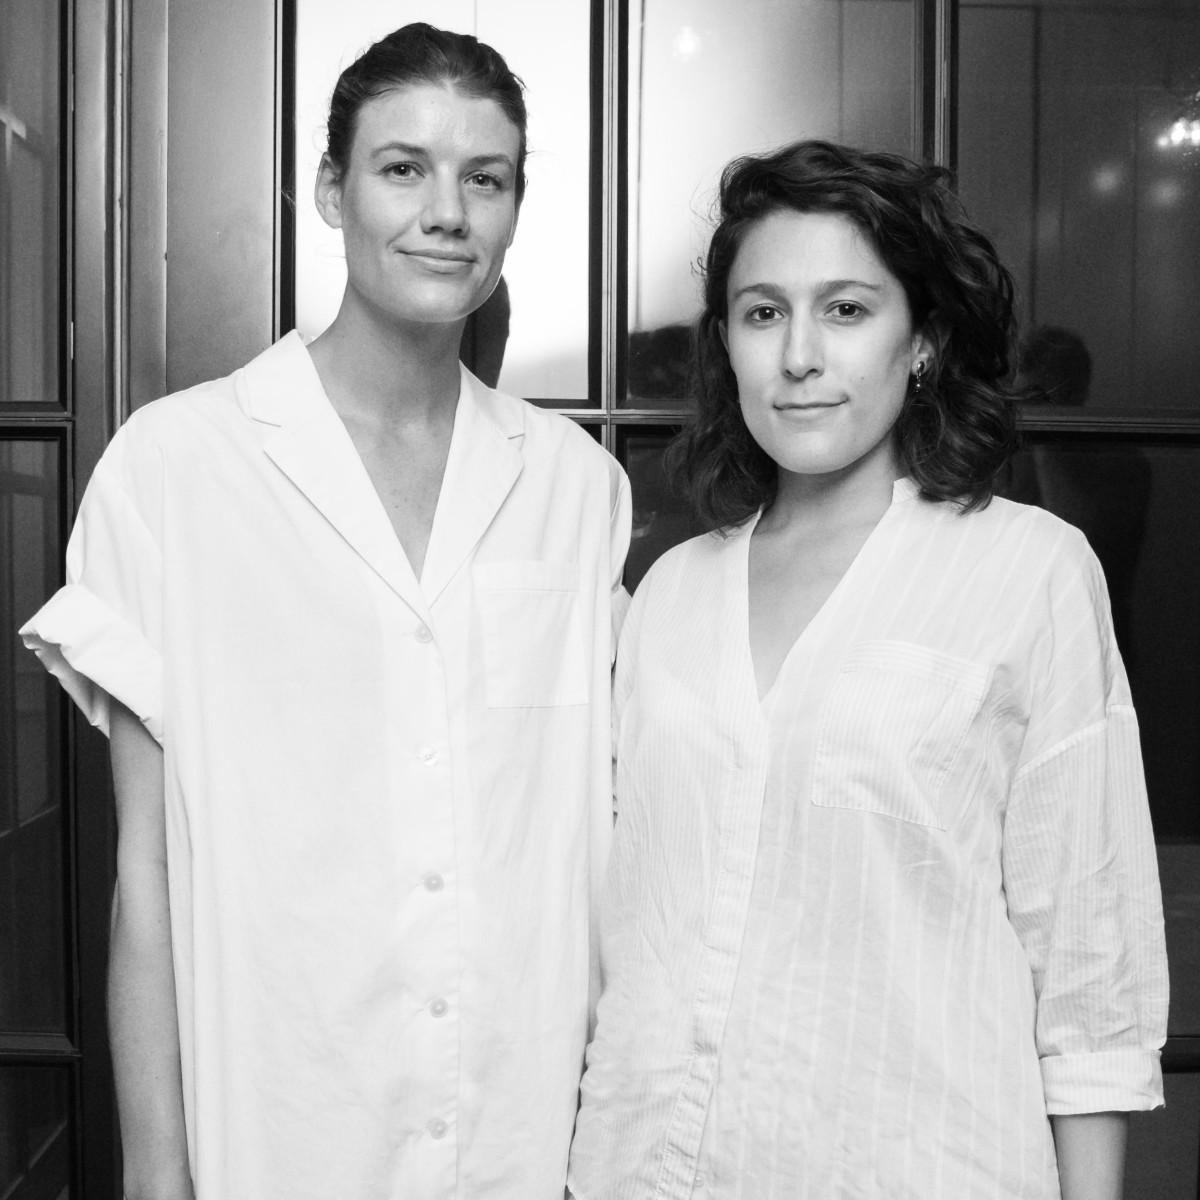 Britt Cosgrove and Marina Polo. Photo: Svilu